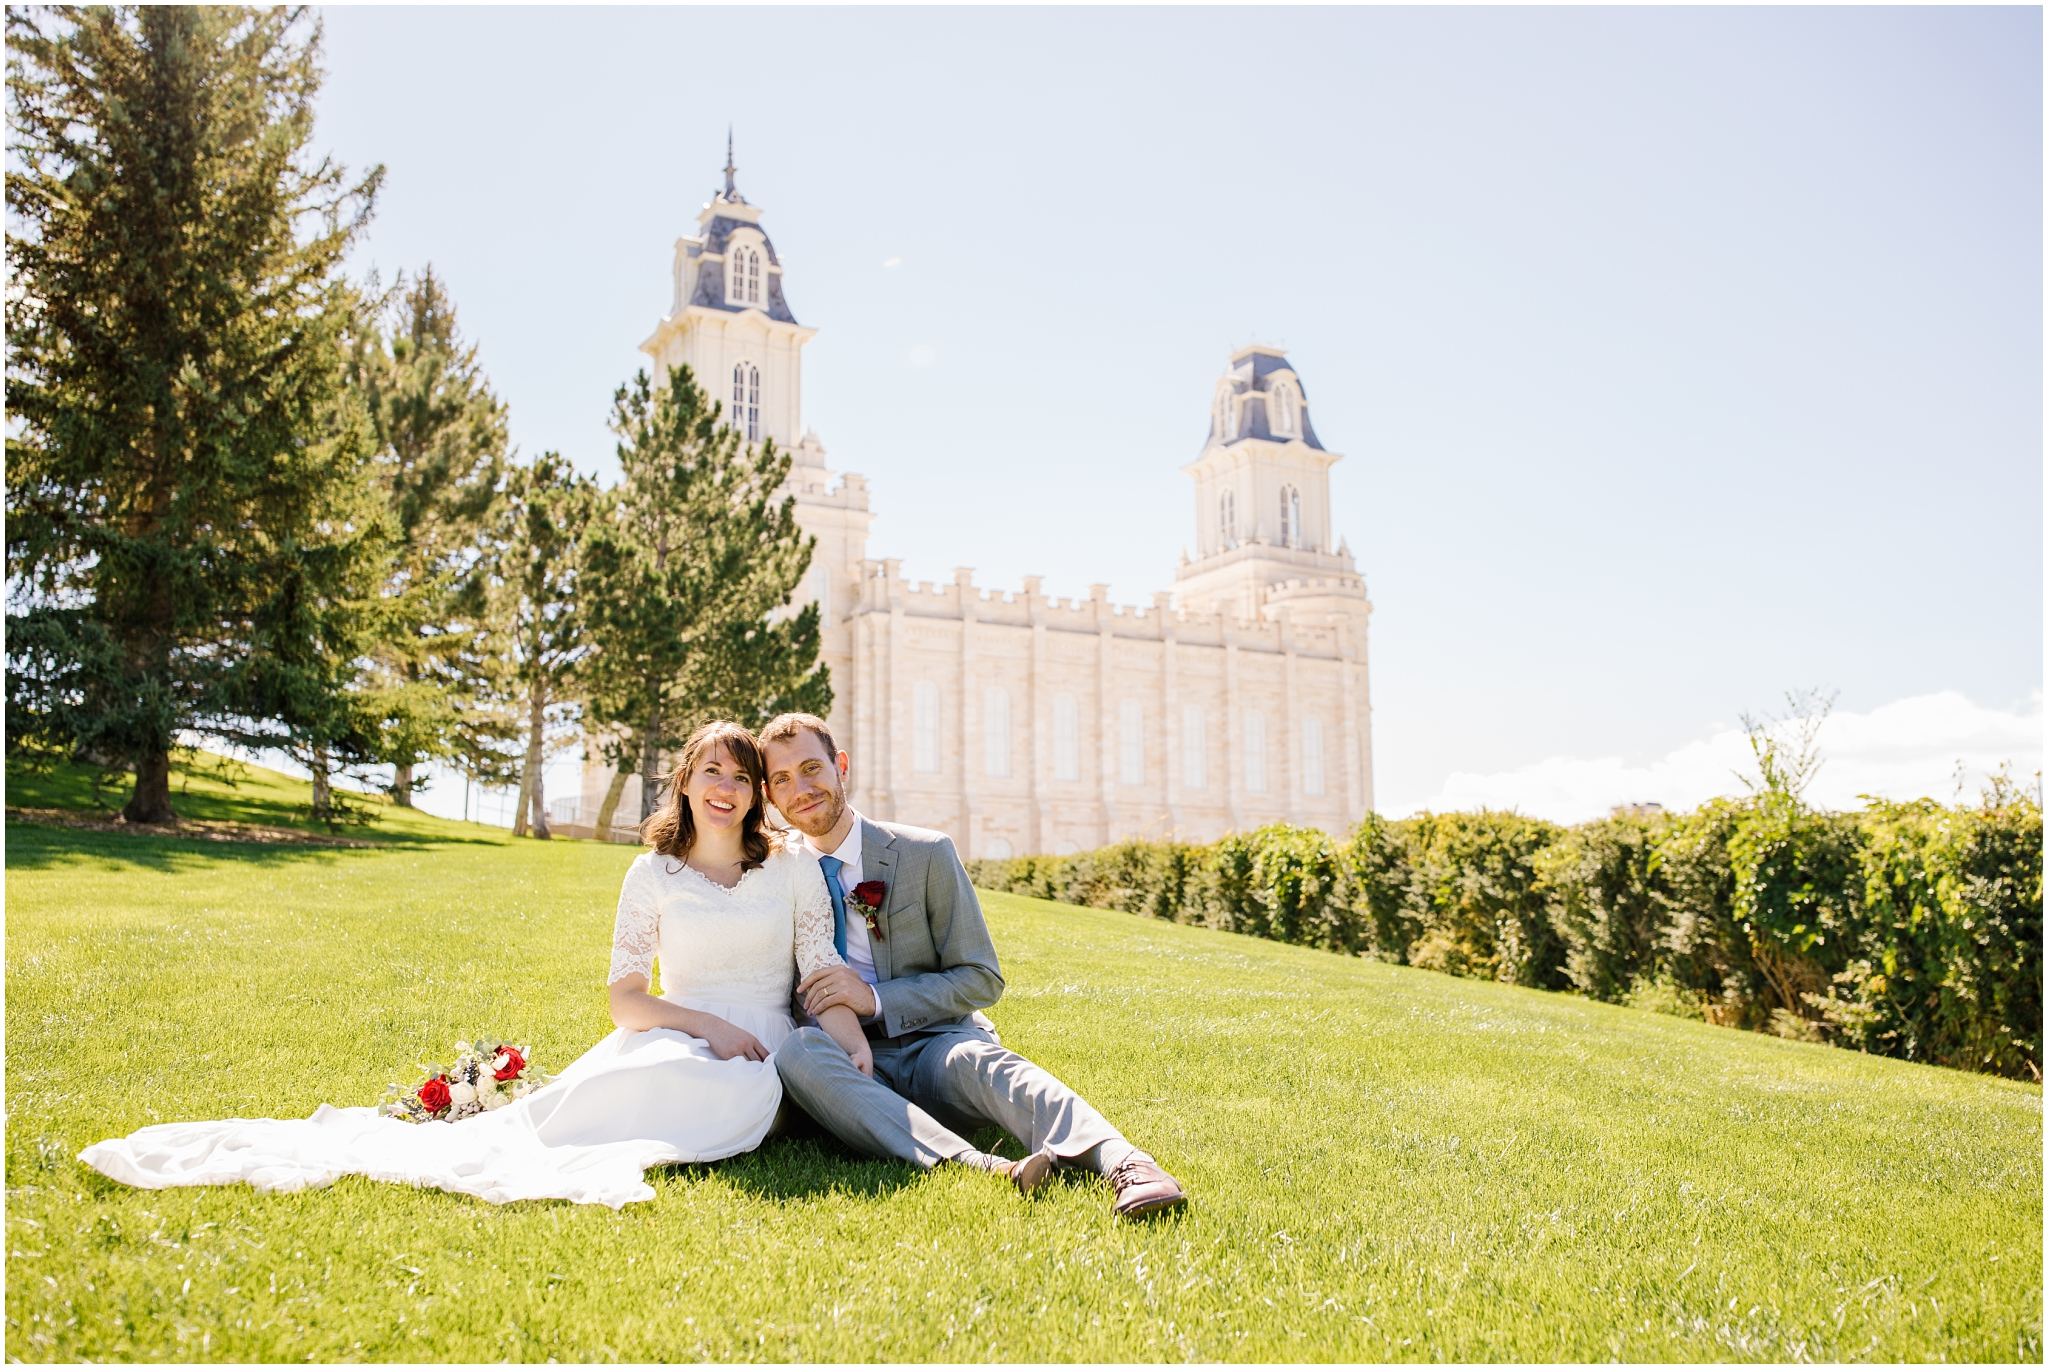 BrynneWinston-150_Lizzie-B-Imagery-Utah-Wedding-Photographer-Utah-County-Manti-Temple.jpg